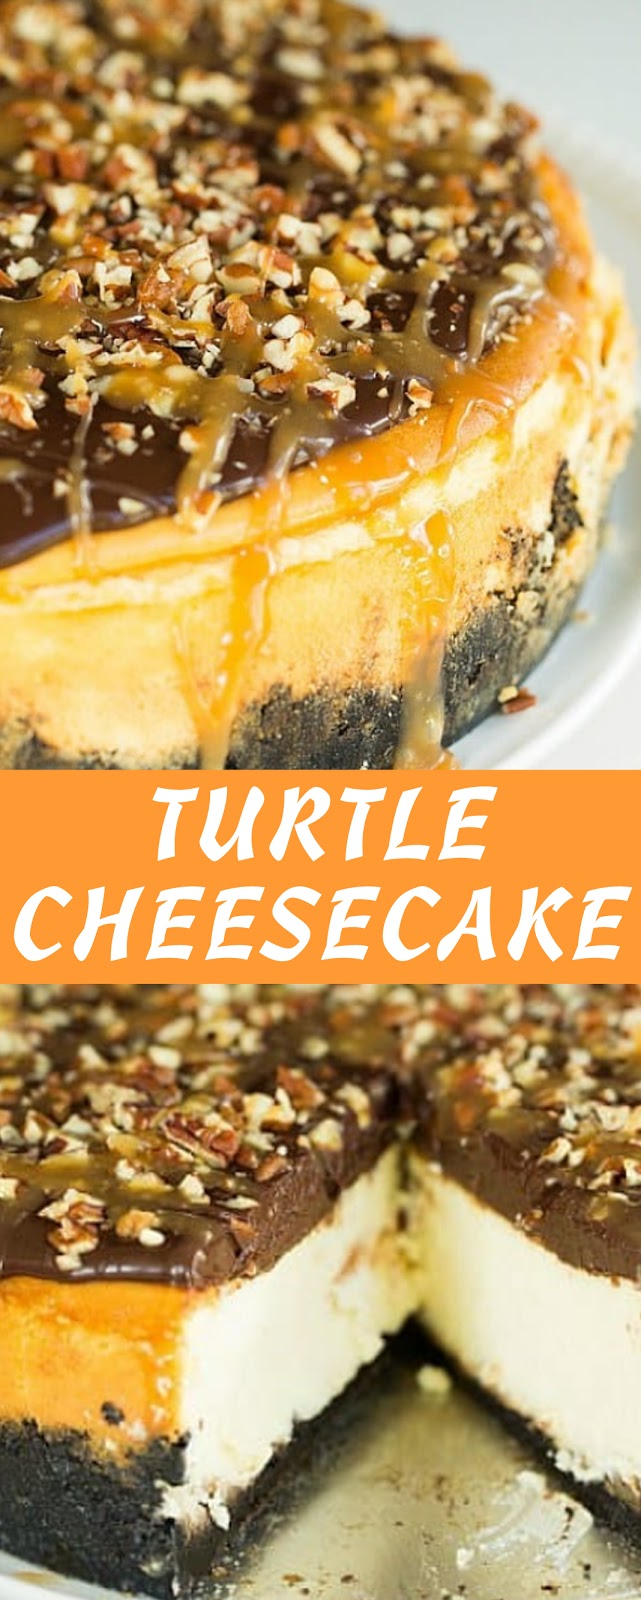 Recipe Turtle cheesecake #cheesecake